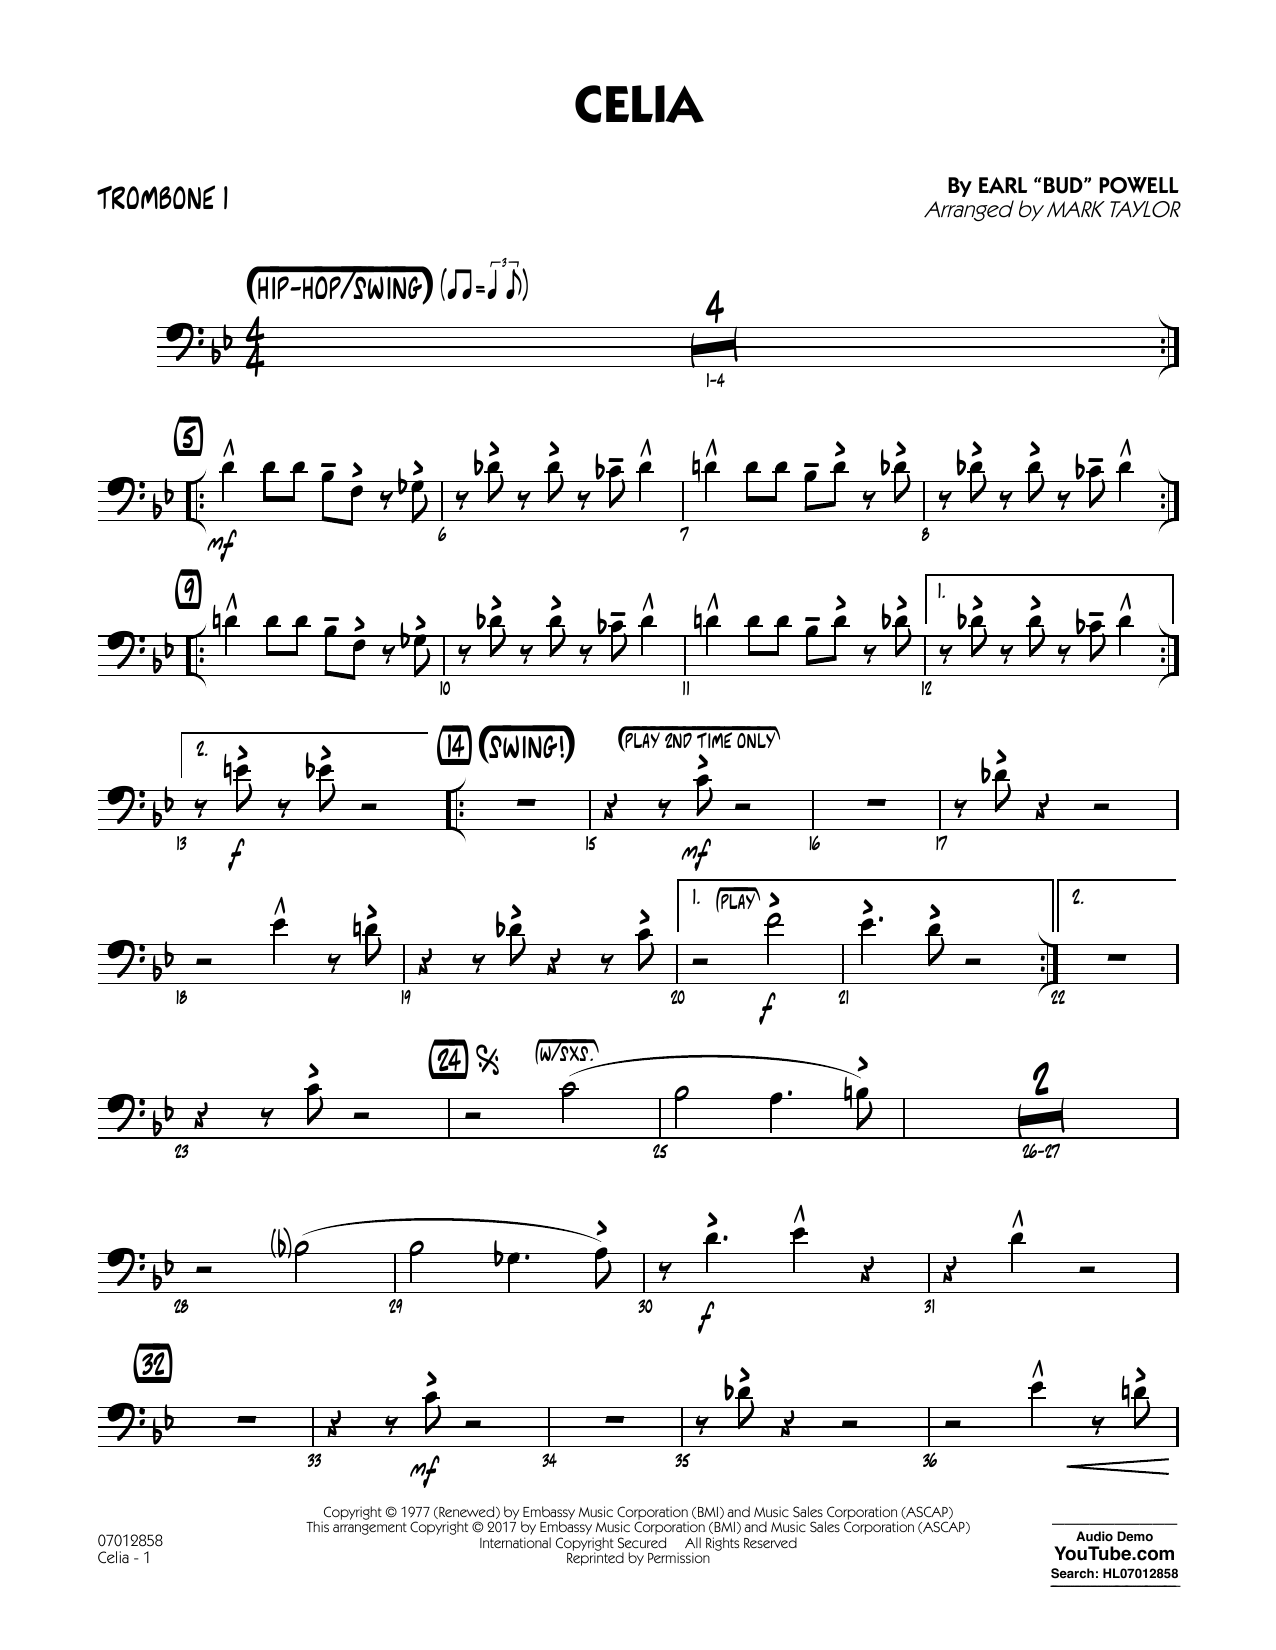 Celia - Trombone 1 Sheet Music